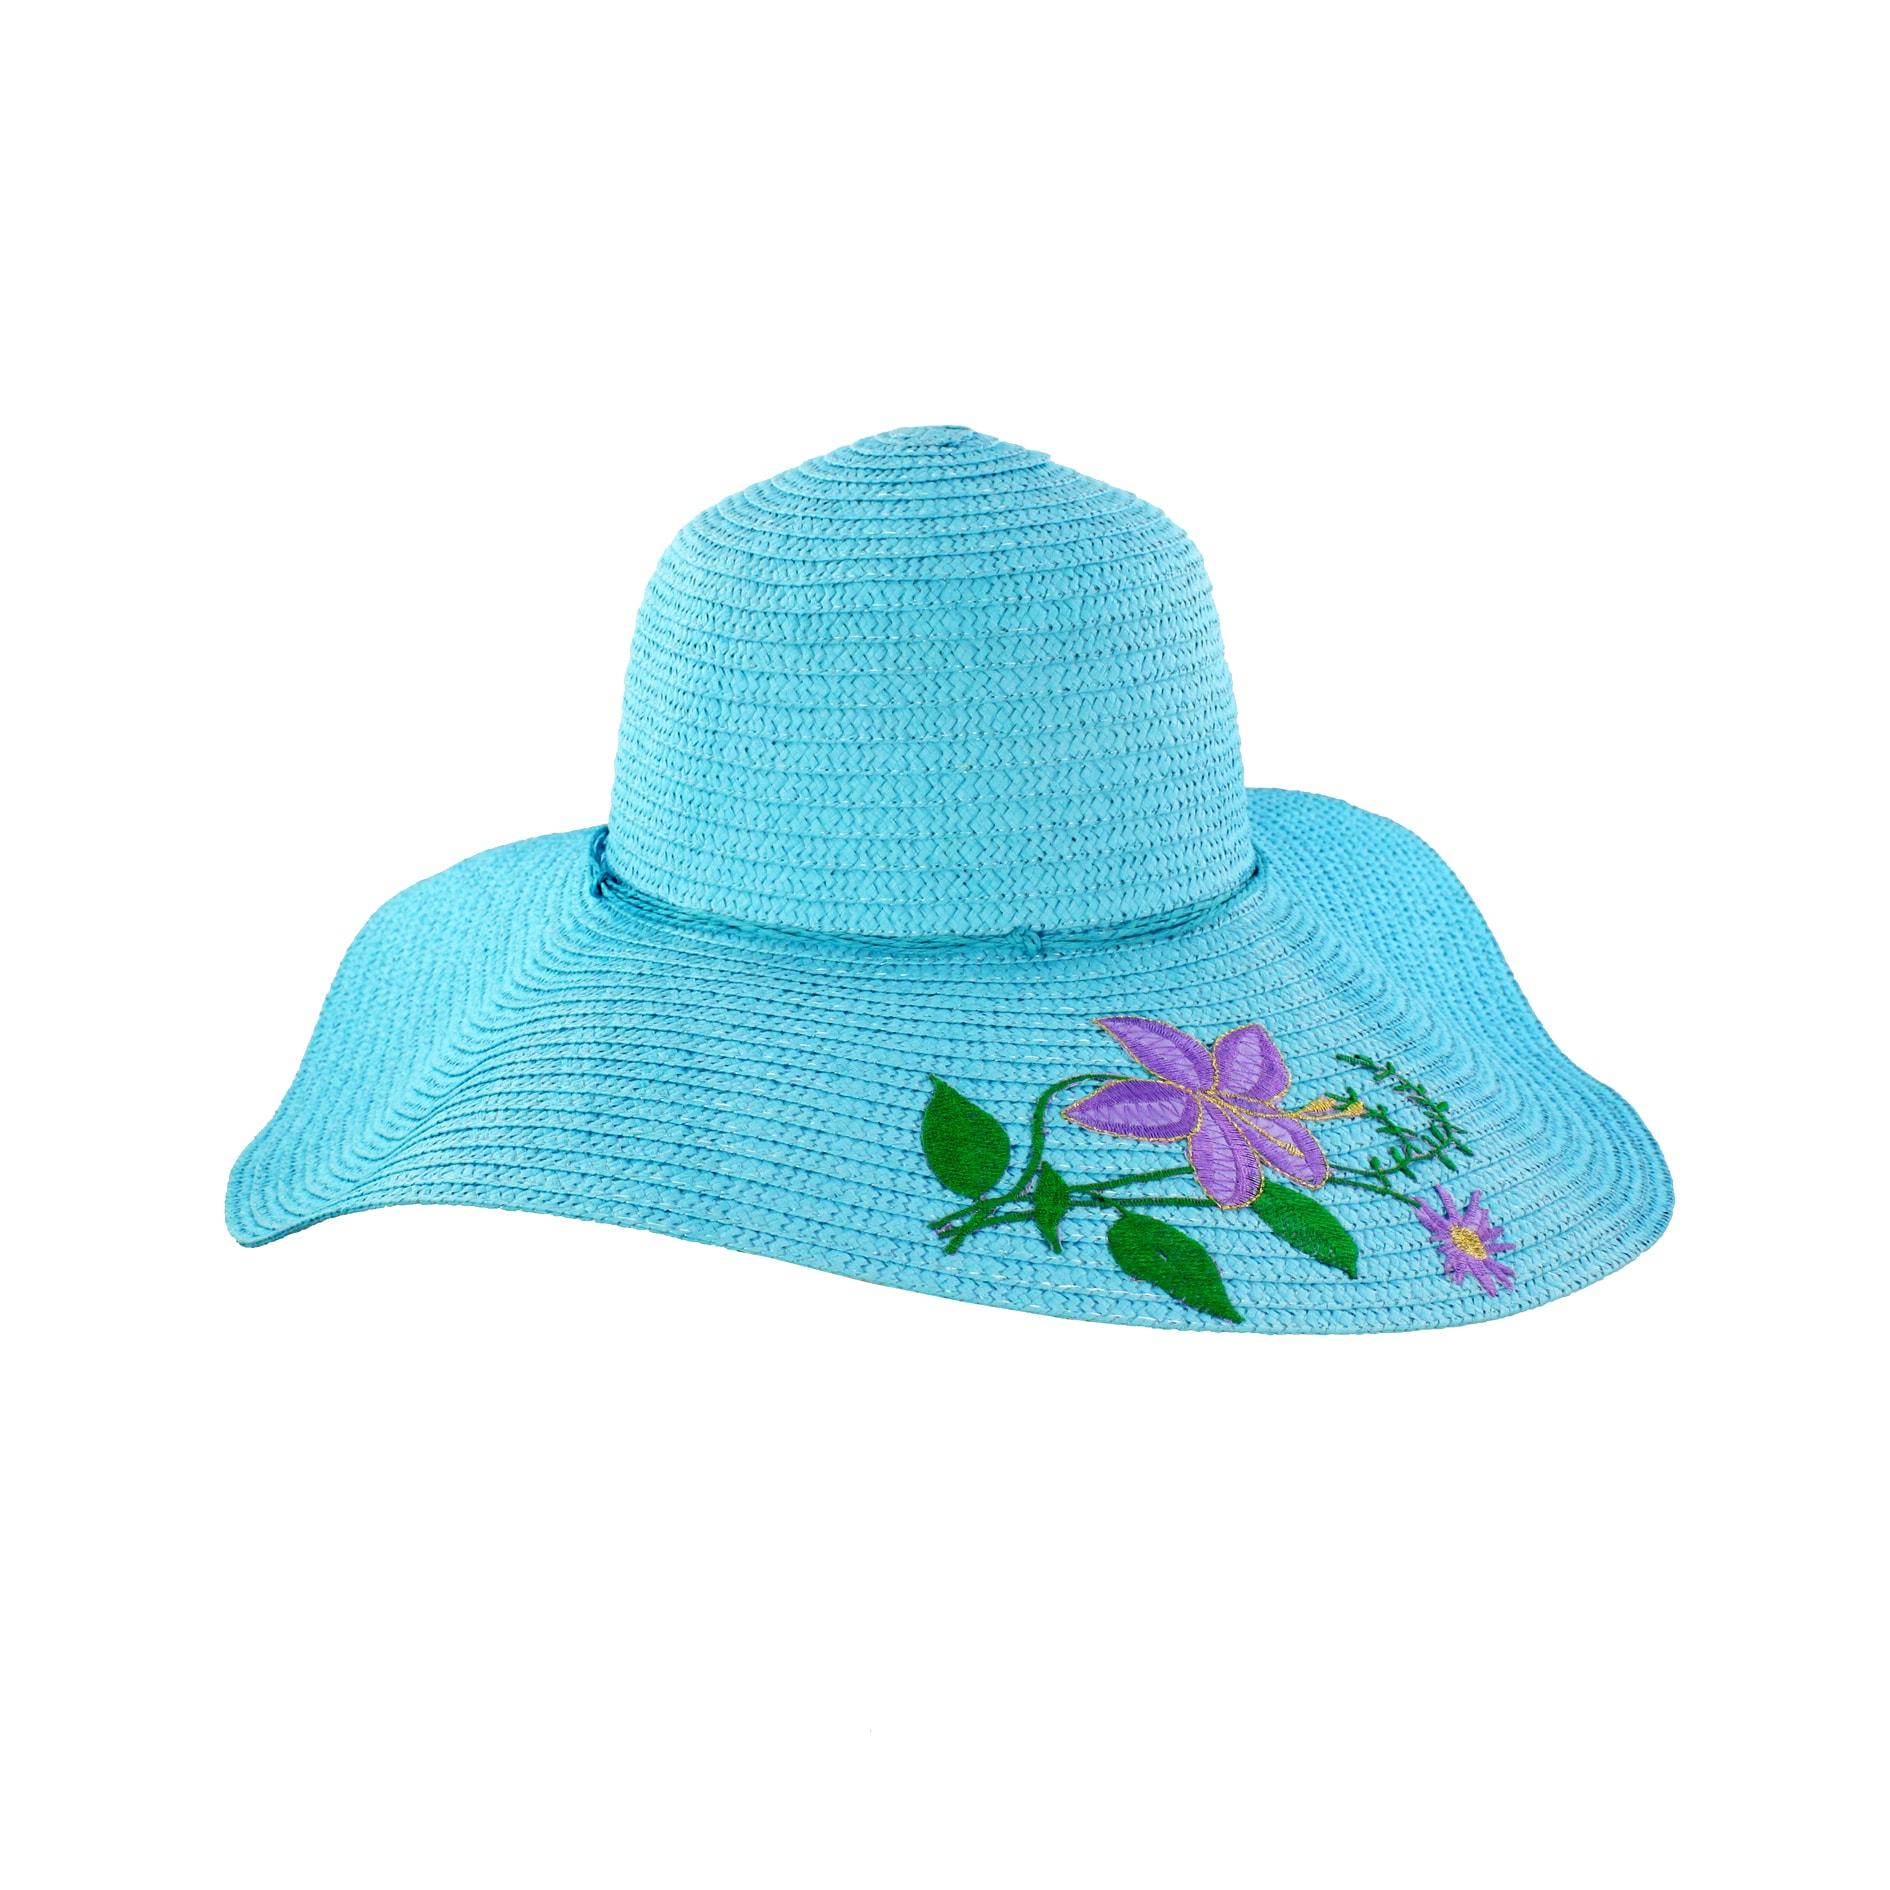 Faddism Women's Blue Flower Straw Sun Hat